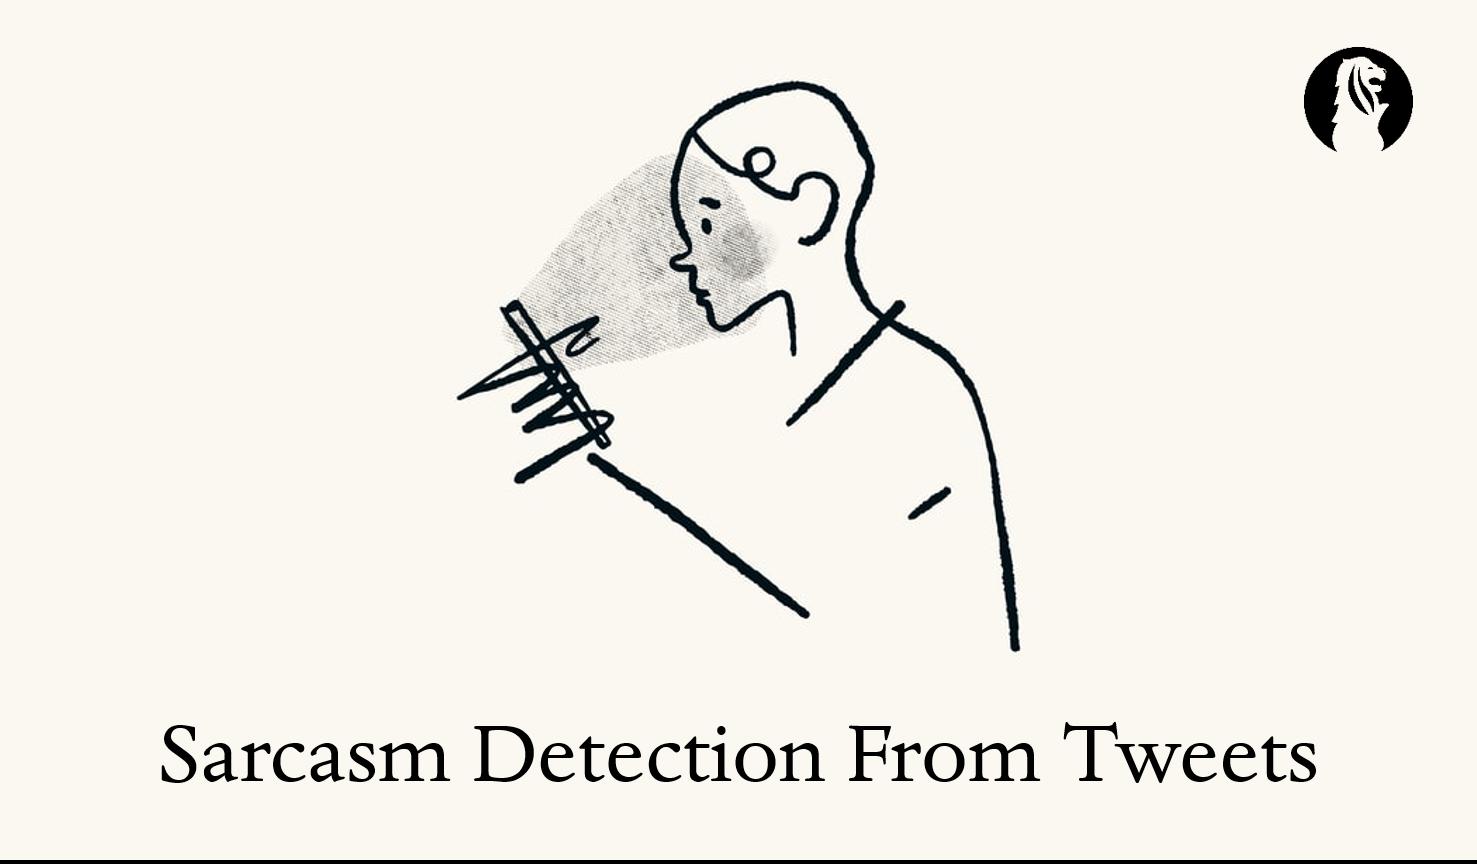 Sarcasm Detection on Tweets